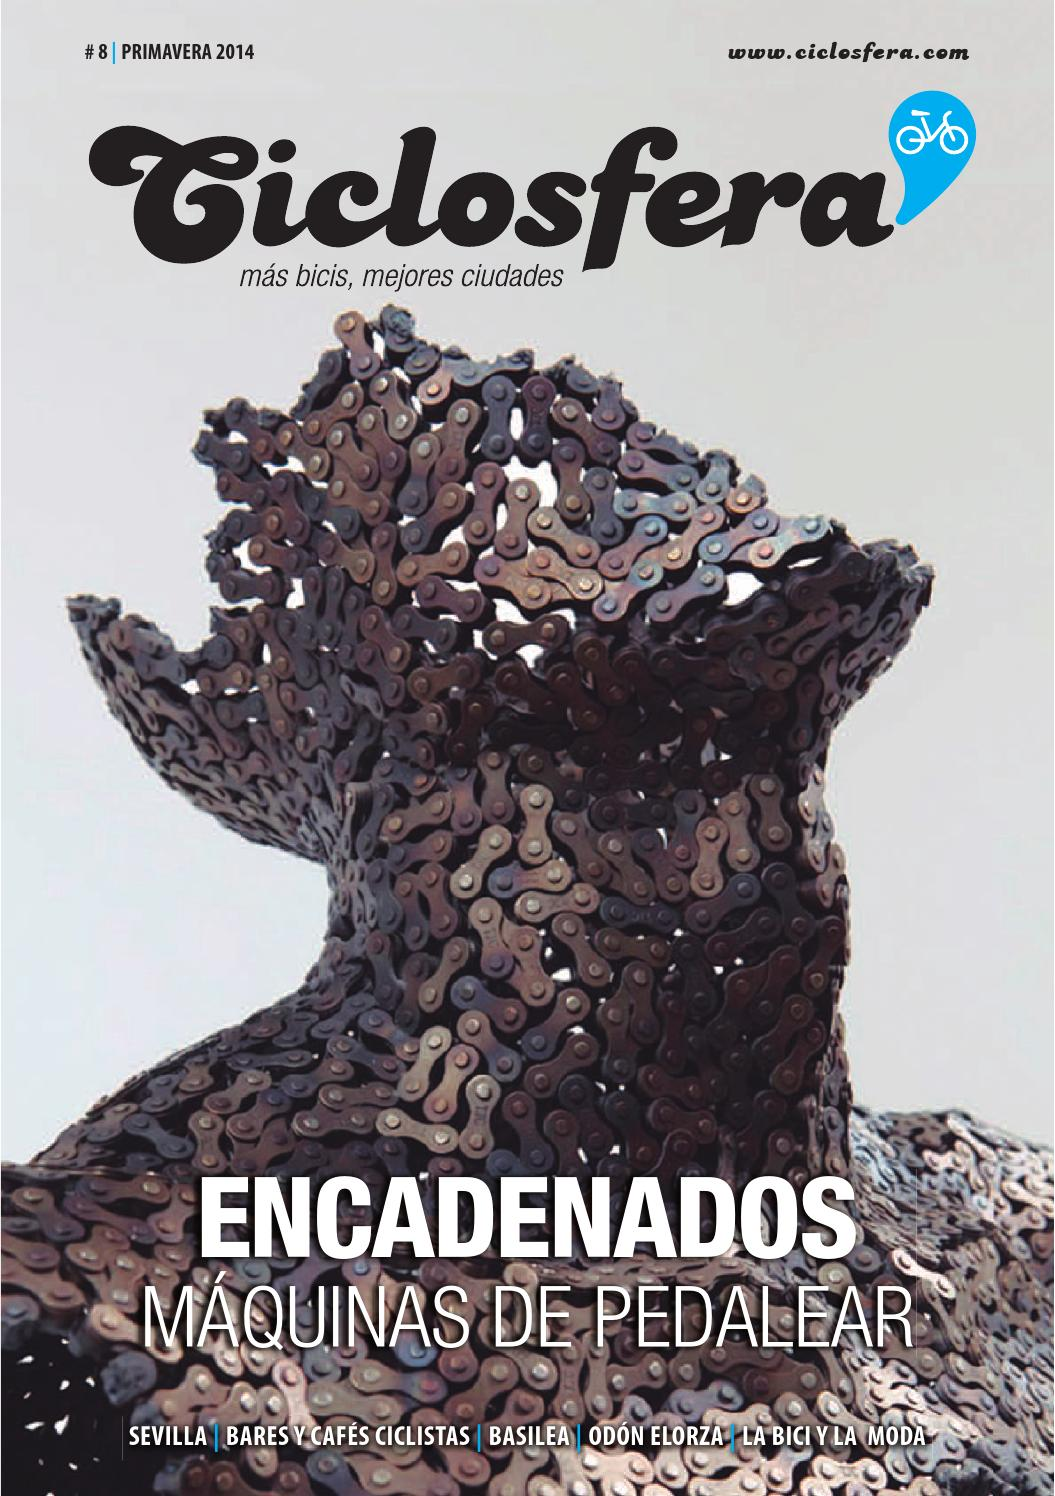 Ciclosfera #8 Primavera 2014 by Revista Ciclosfera - issuu